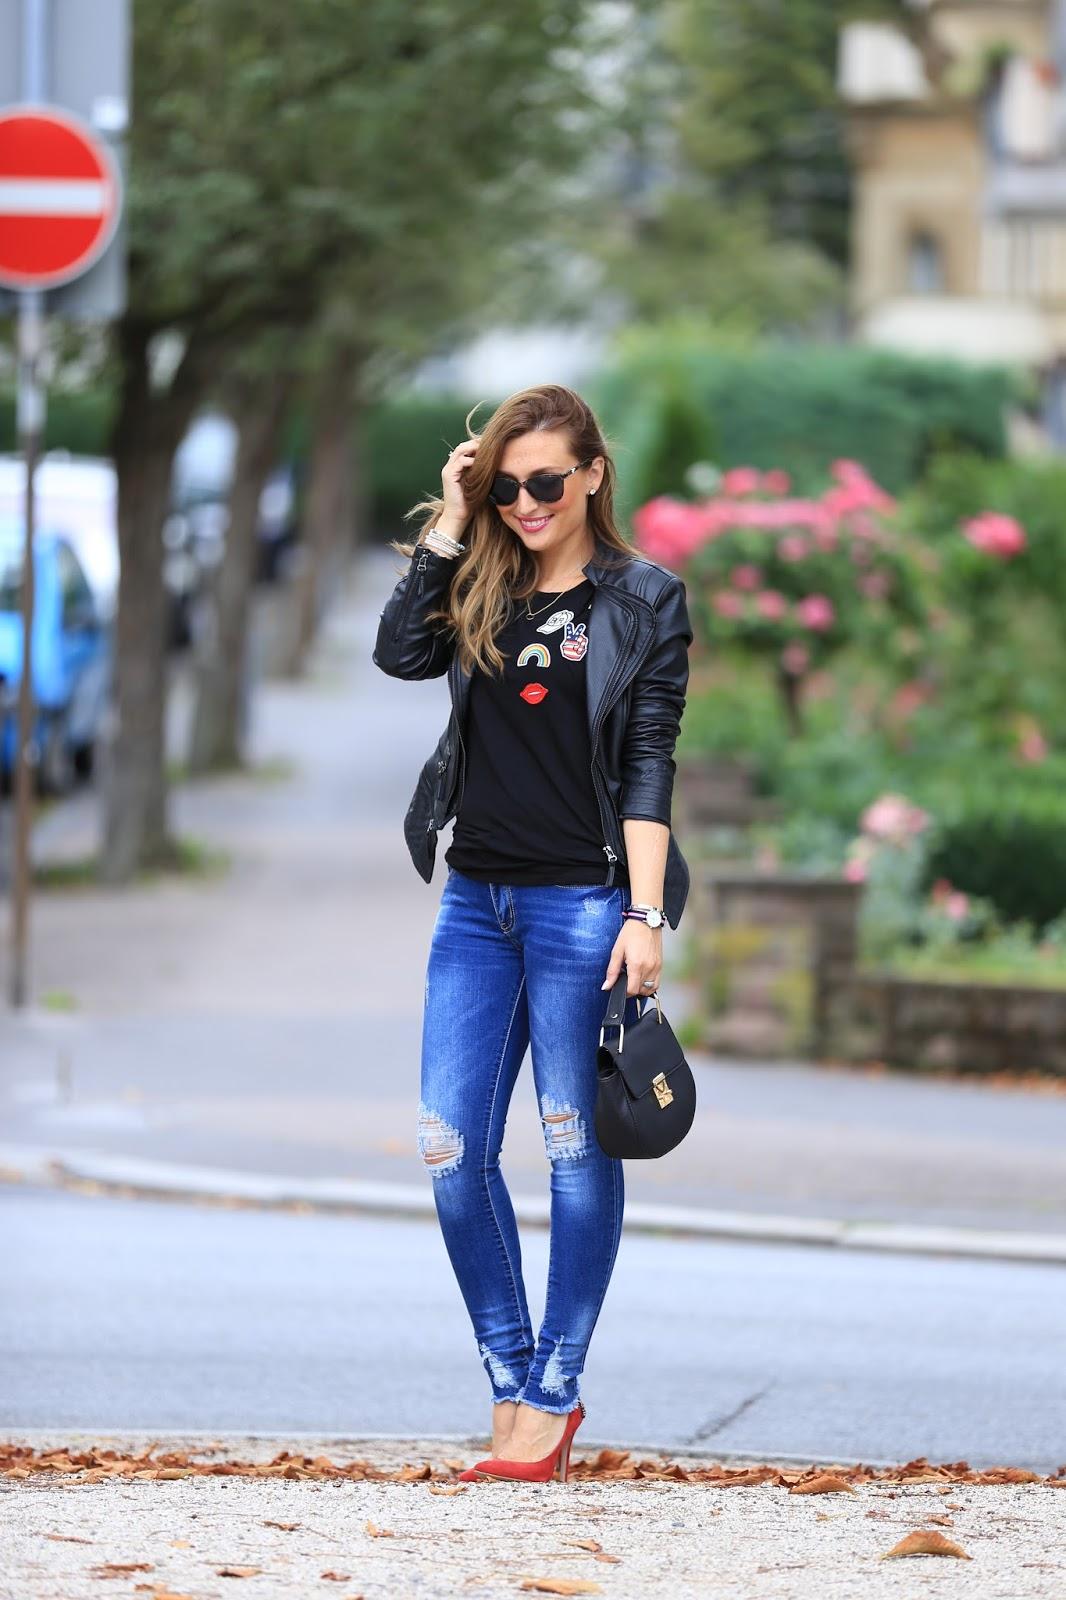 MTZ-Blogger-Frankfurt-Umstyling-Shopping-fashionstylebyjohanna-Blog-Outfit-Fashionblogger-Fashionblogger FrankfurtStreetstyle-Oversize-Mantel-Nike-Air-Force-Fashionblogger-Frank